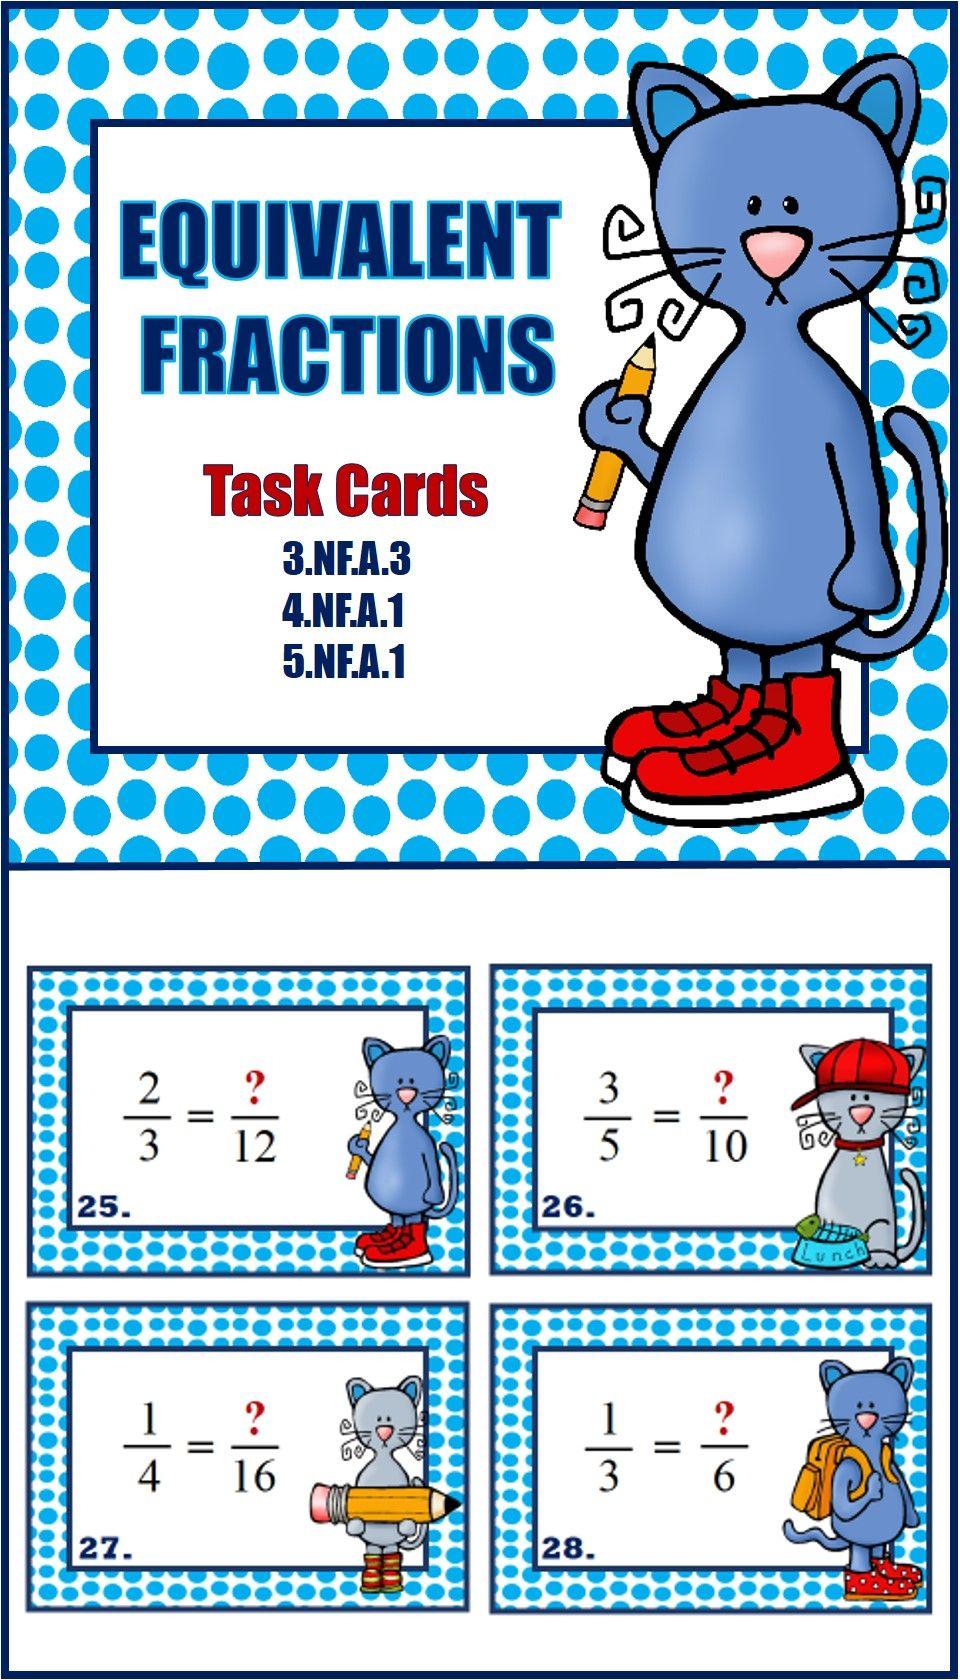 Equivalent Fractions | Equivalent fractions, Math fractions and Math